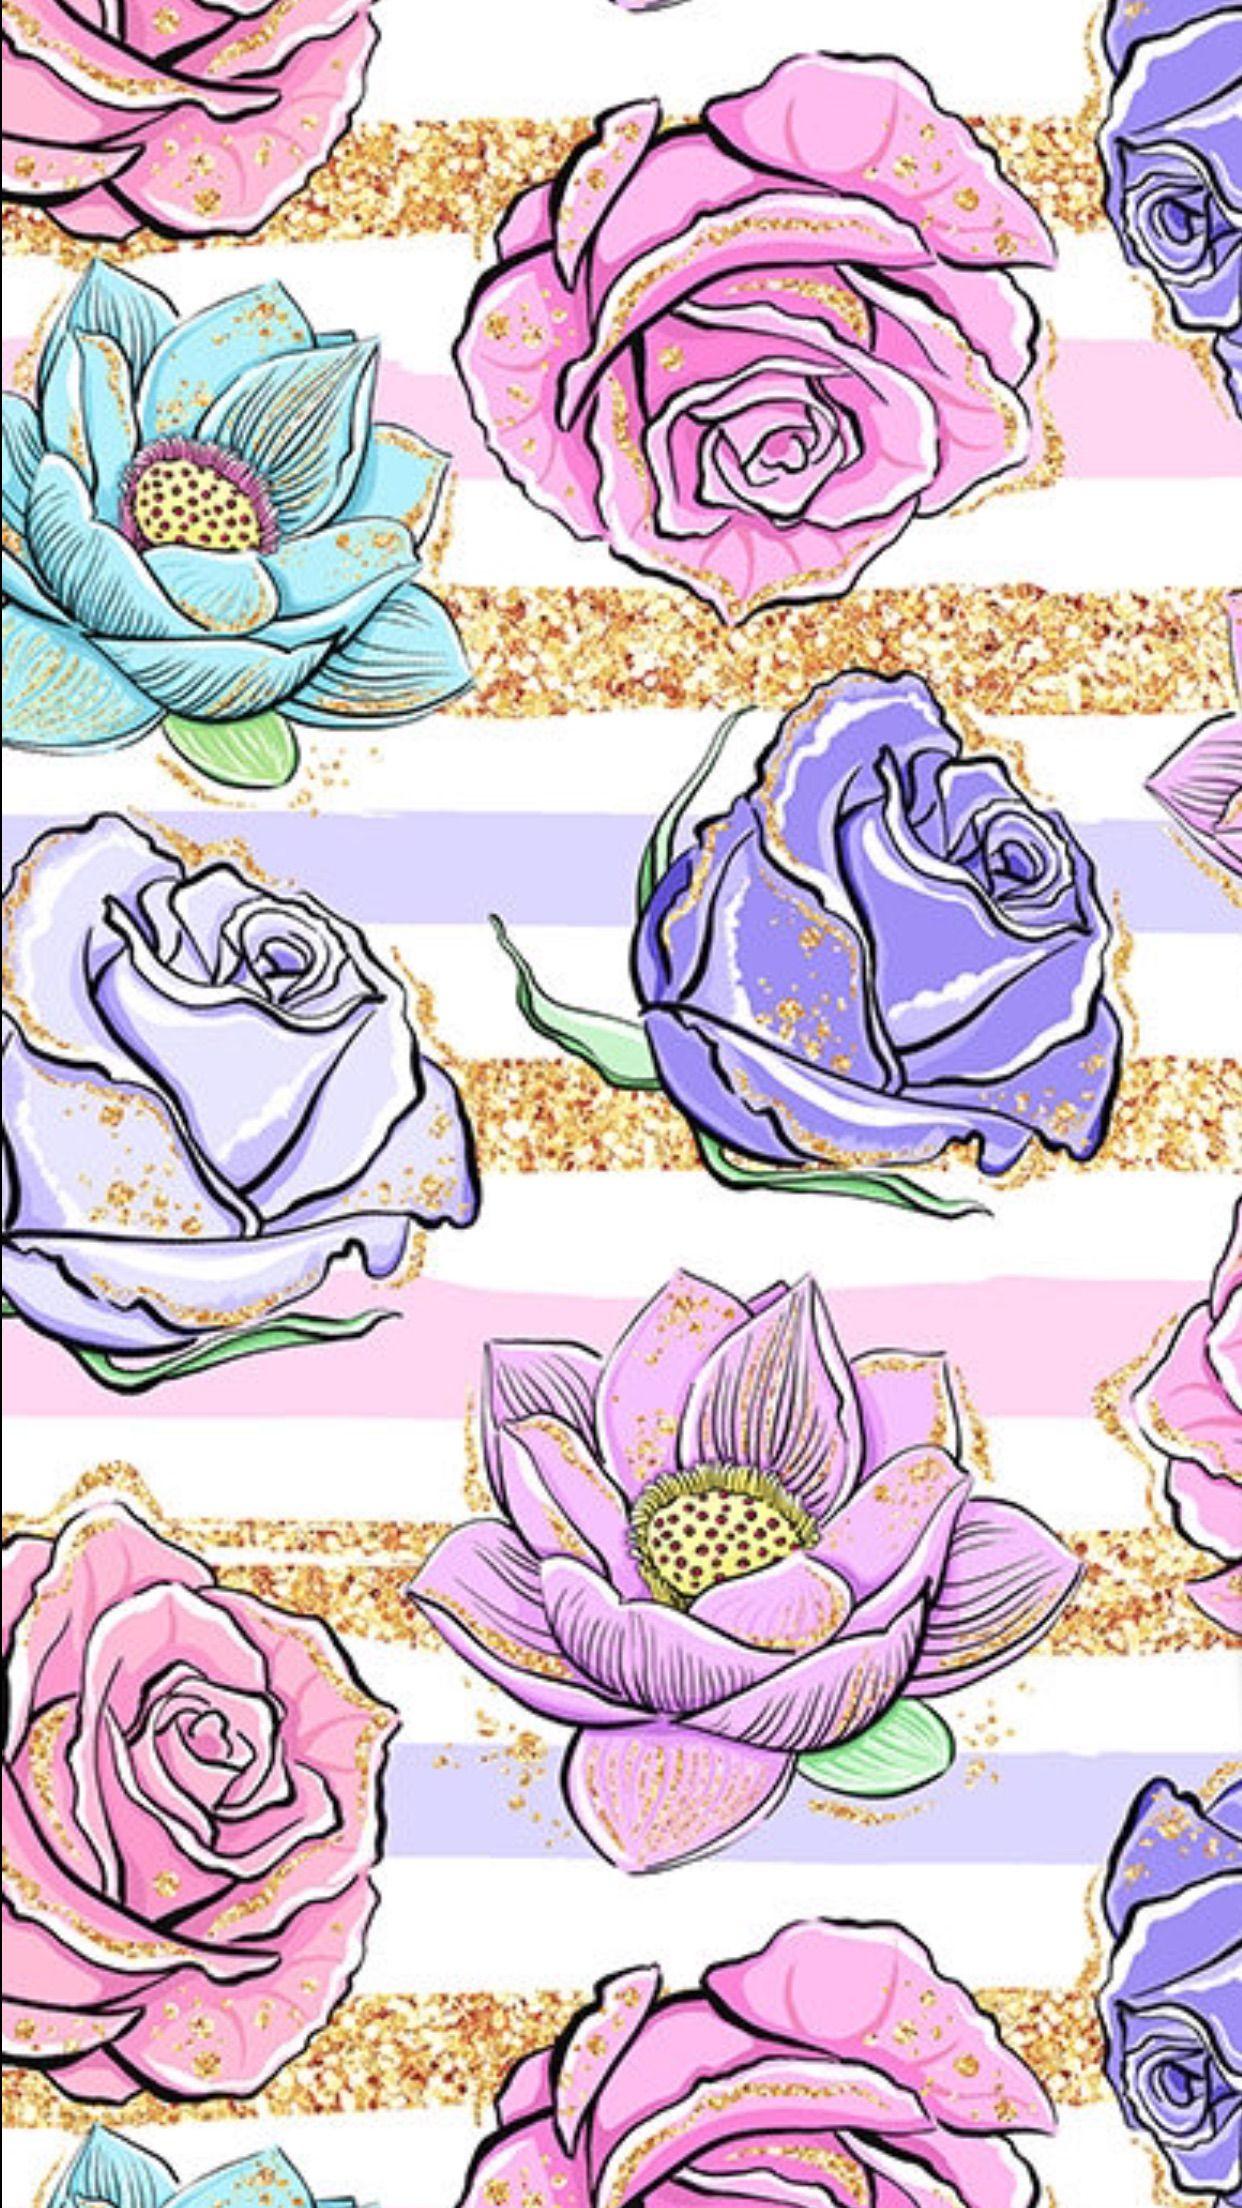 خلفيات ورد Flower Phone Wallpaper Floral Wallpaper Flowery Wallpaper